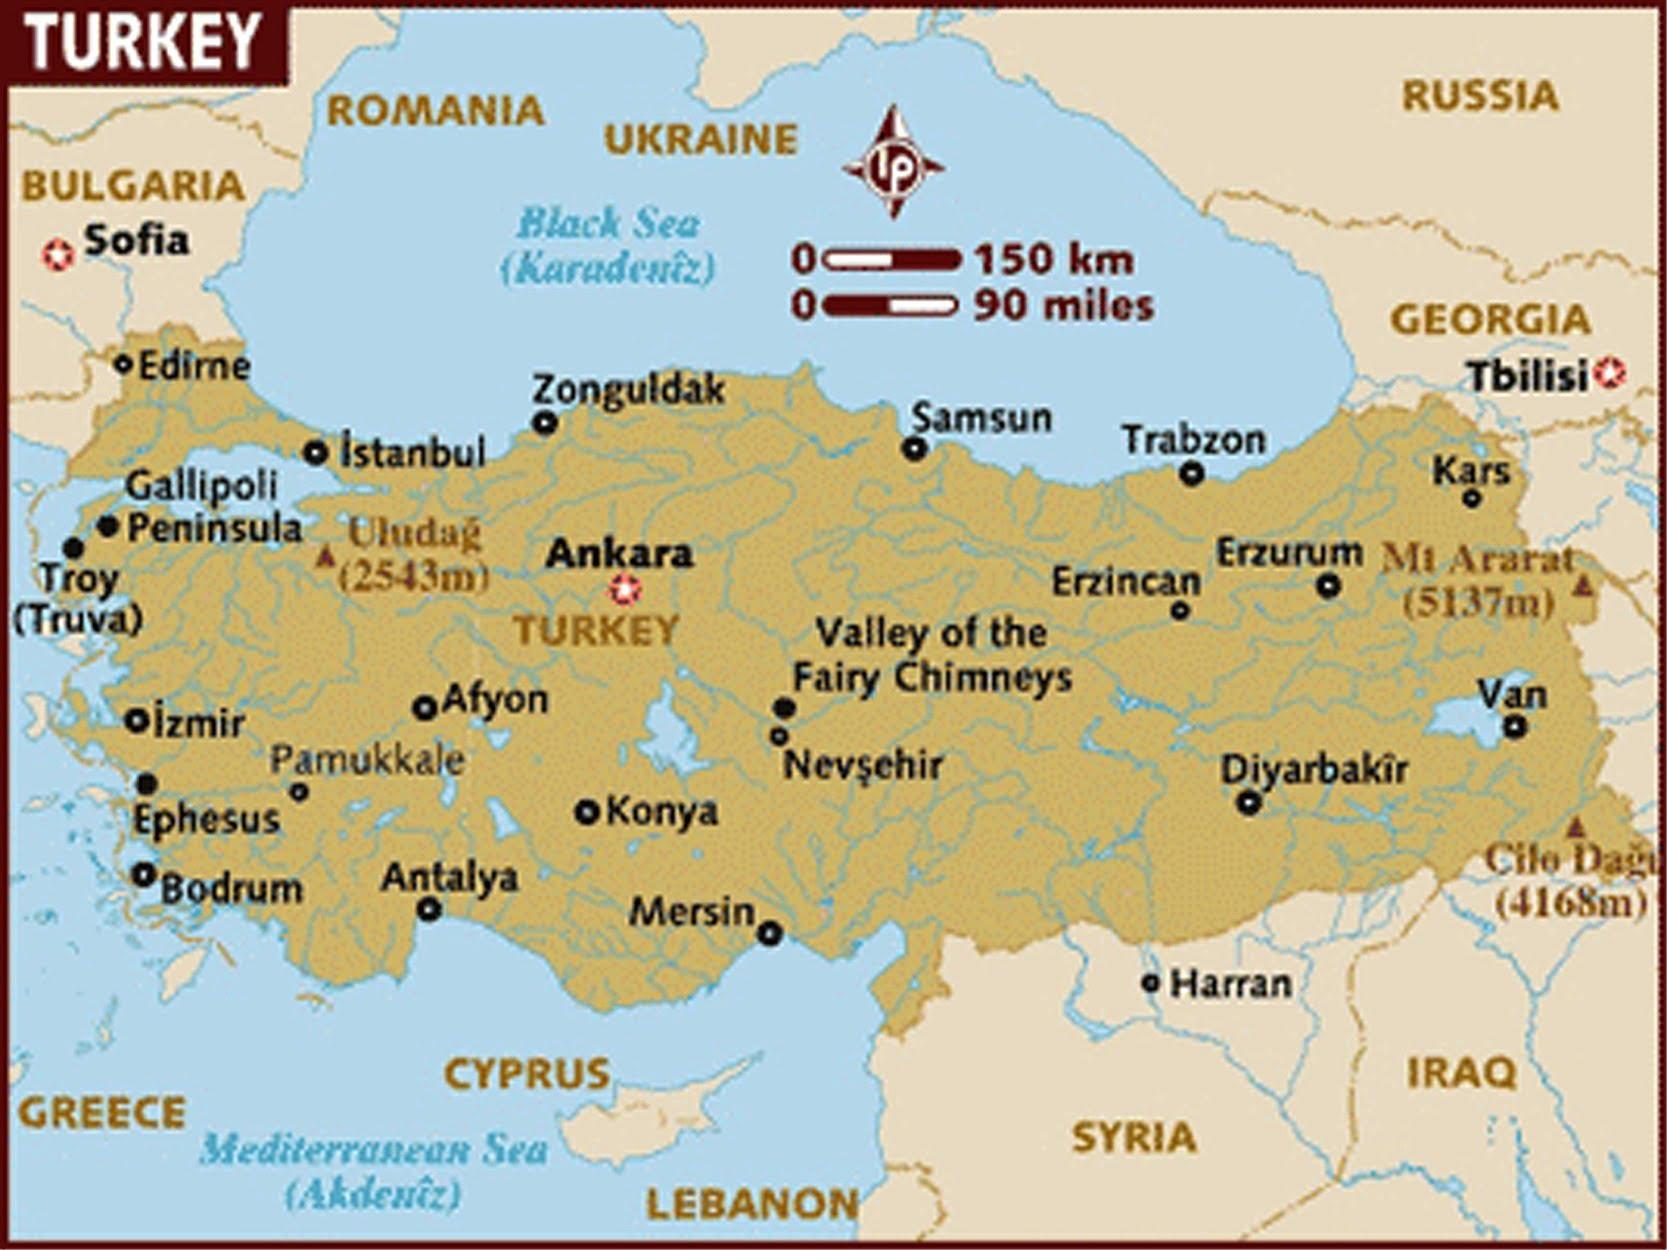 peta wilayah negara turki